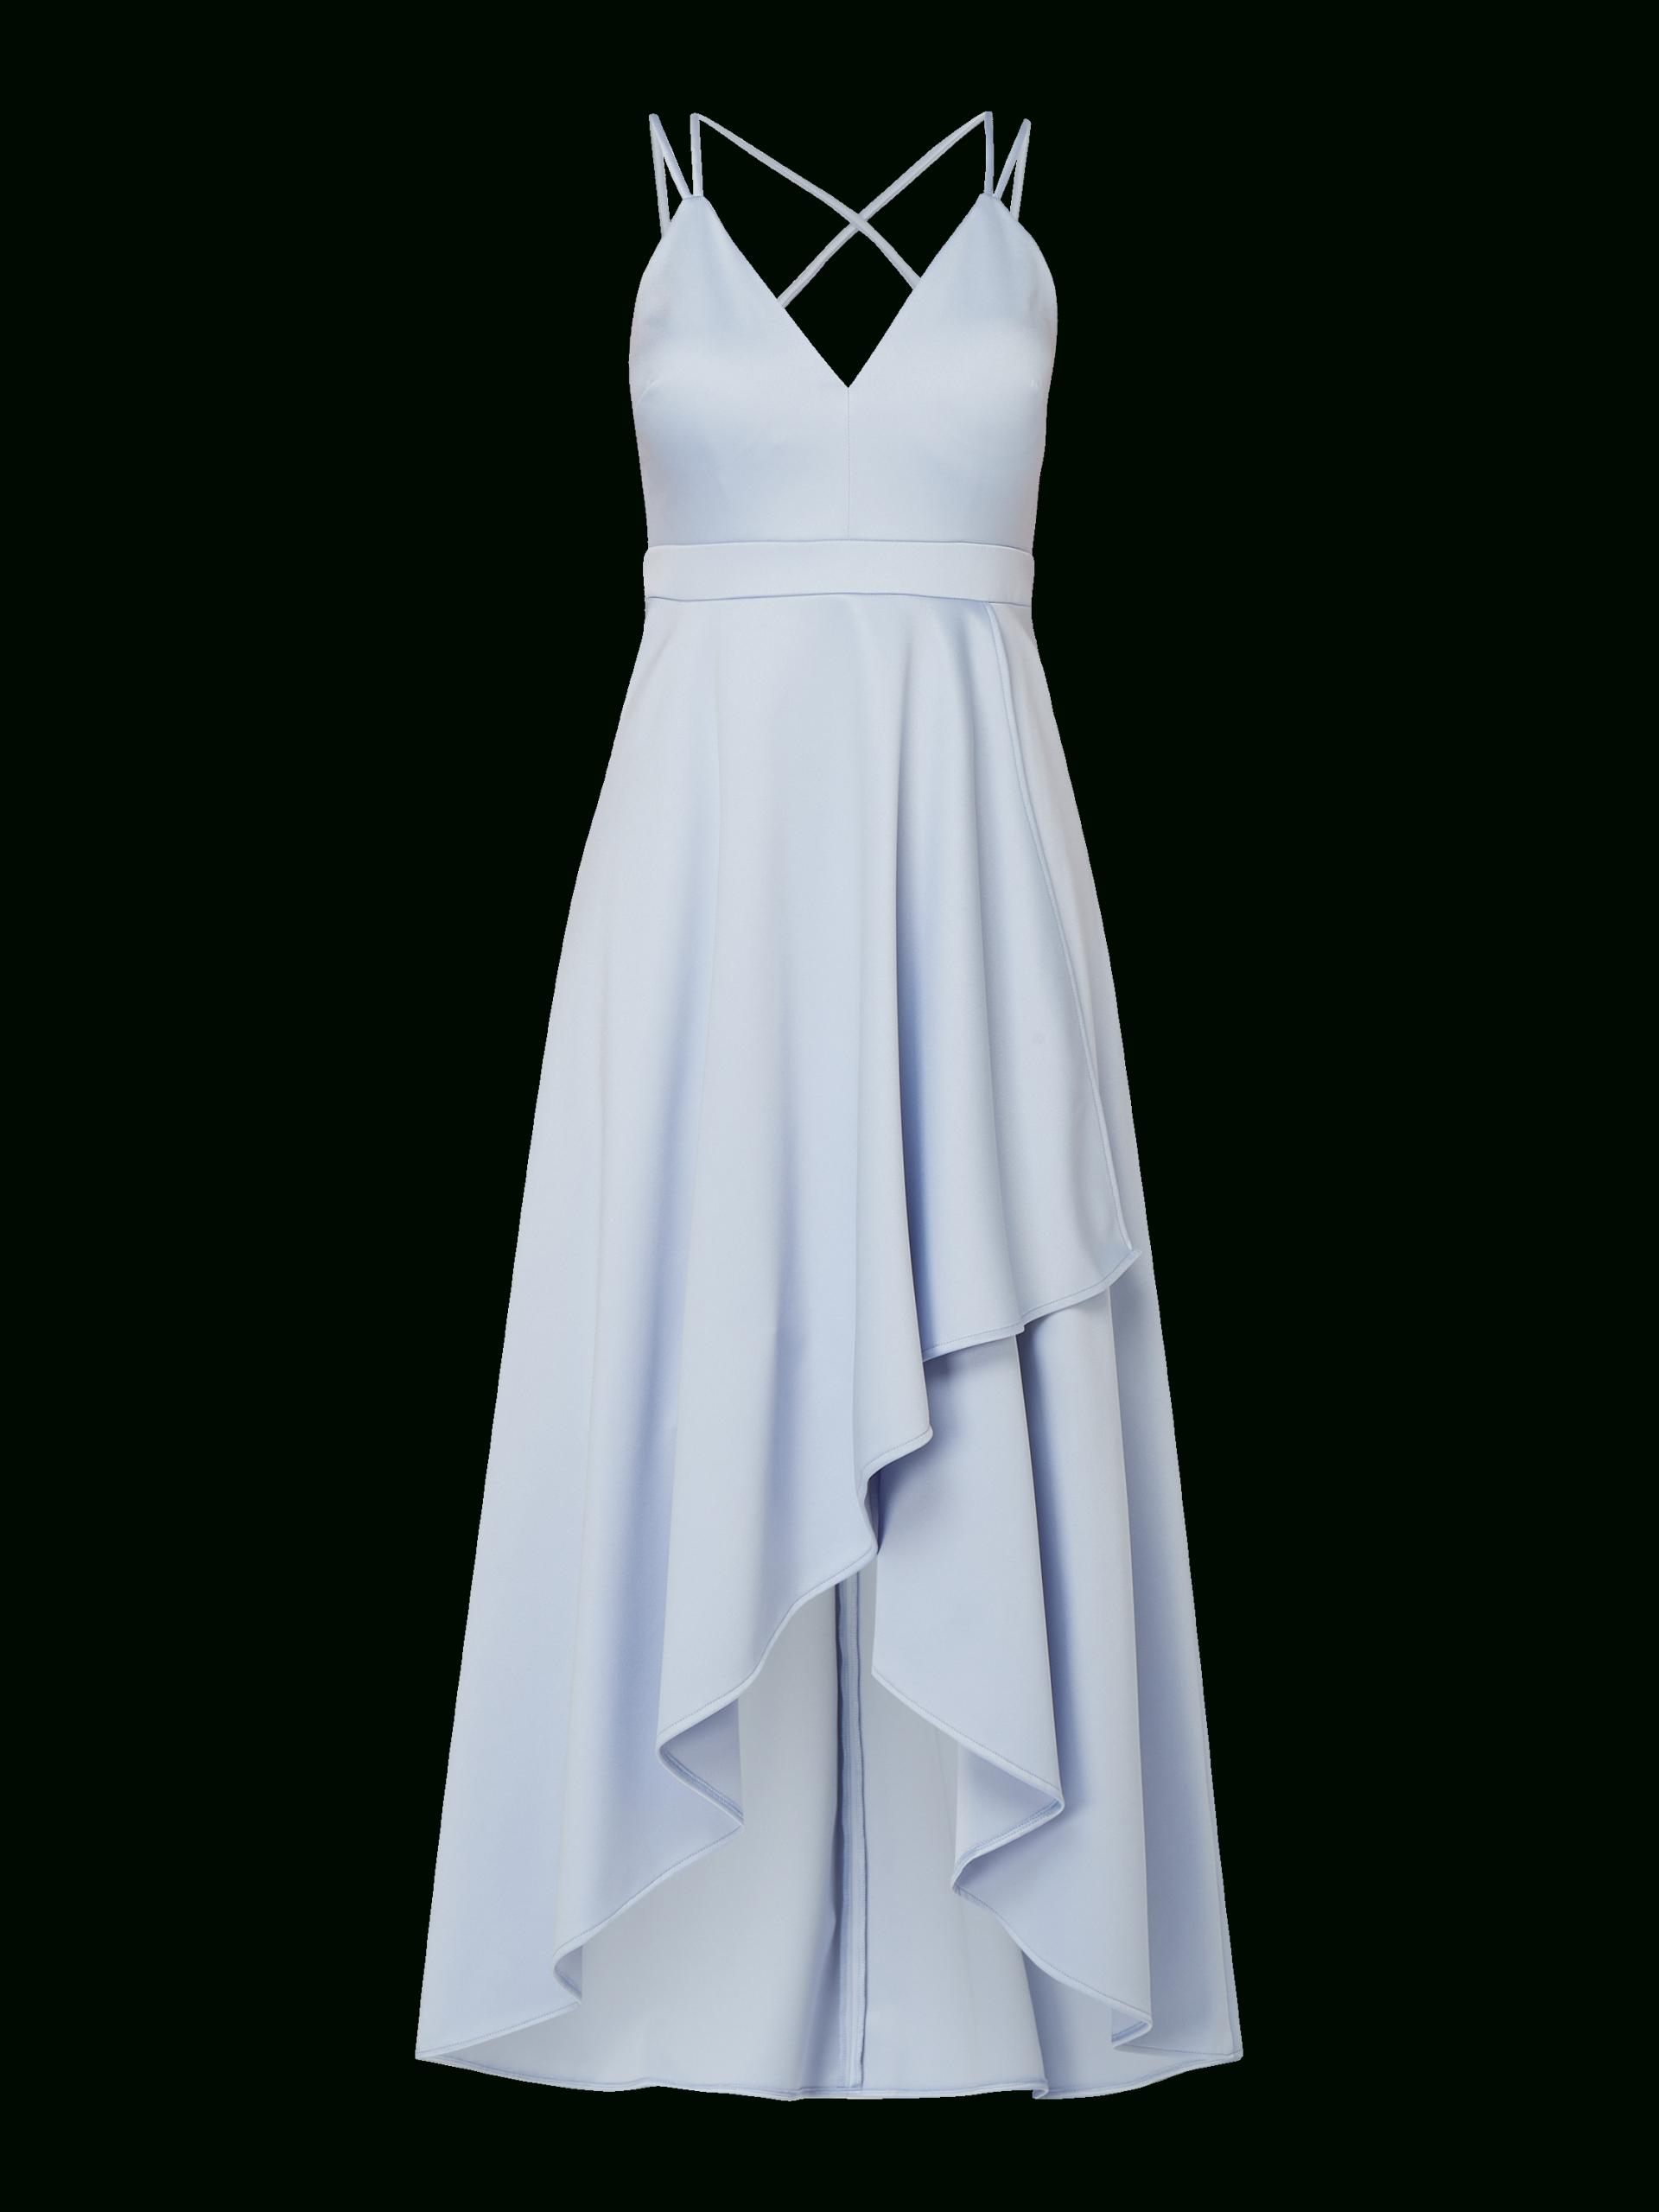 20 Perfekt Abendkleid Vokuhila Bester Preis13 Einfach Abendkleid Vokuhila Bester Preis